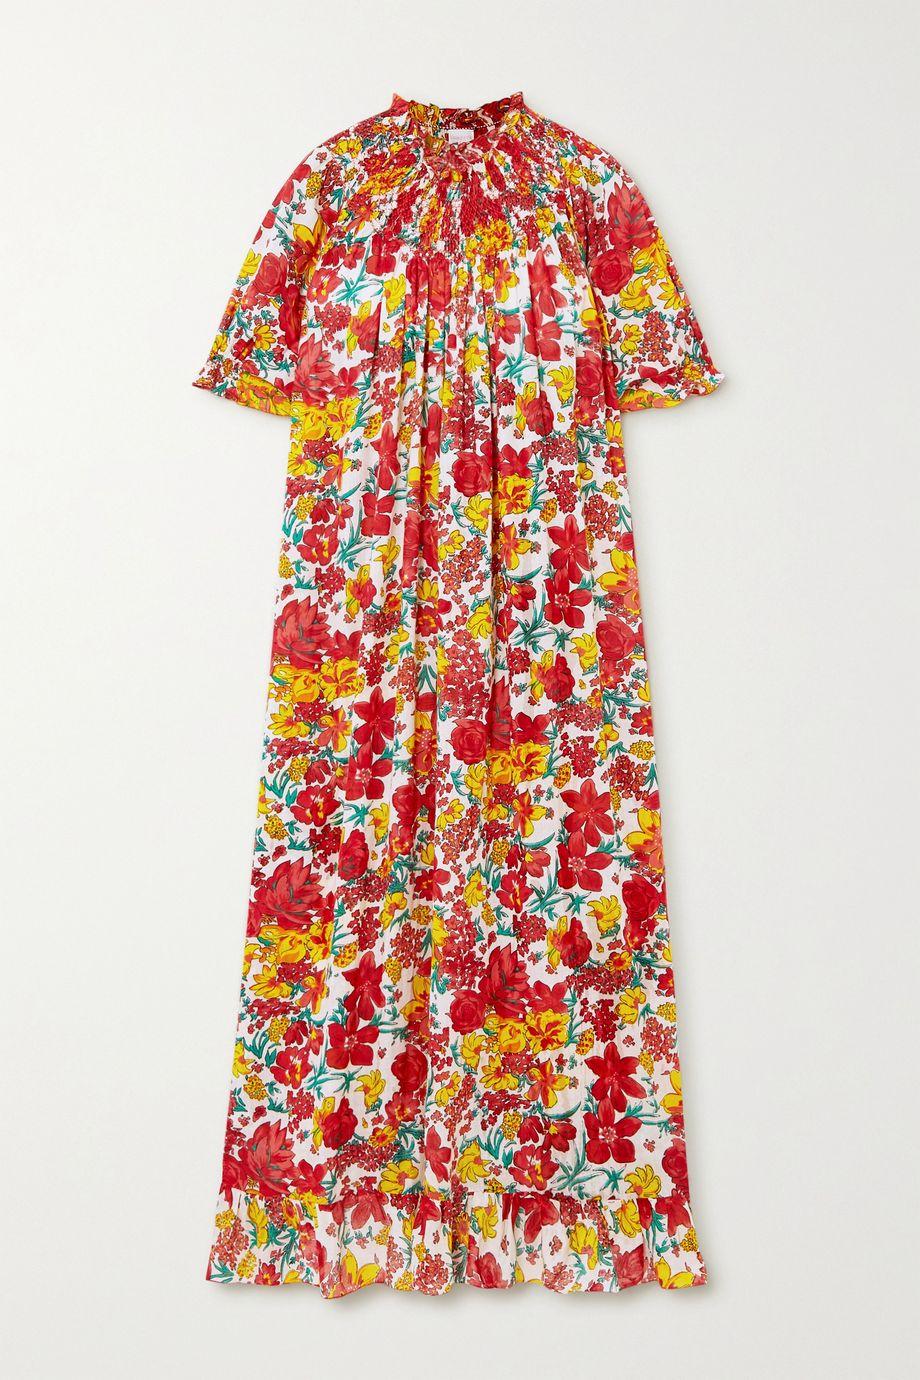 Loretta Caponi Robe midi en voile de coton à imprimé fleuri, smocks et volants Loretta